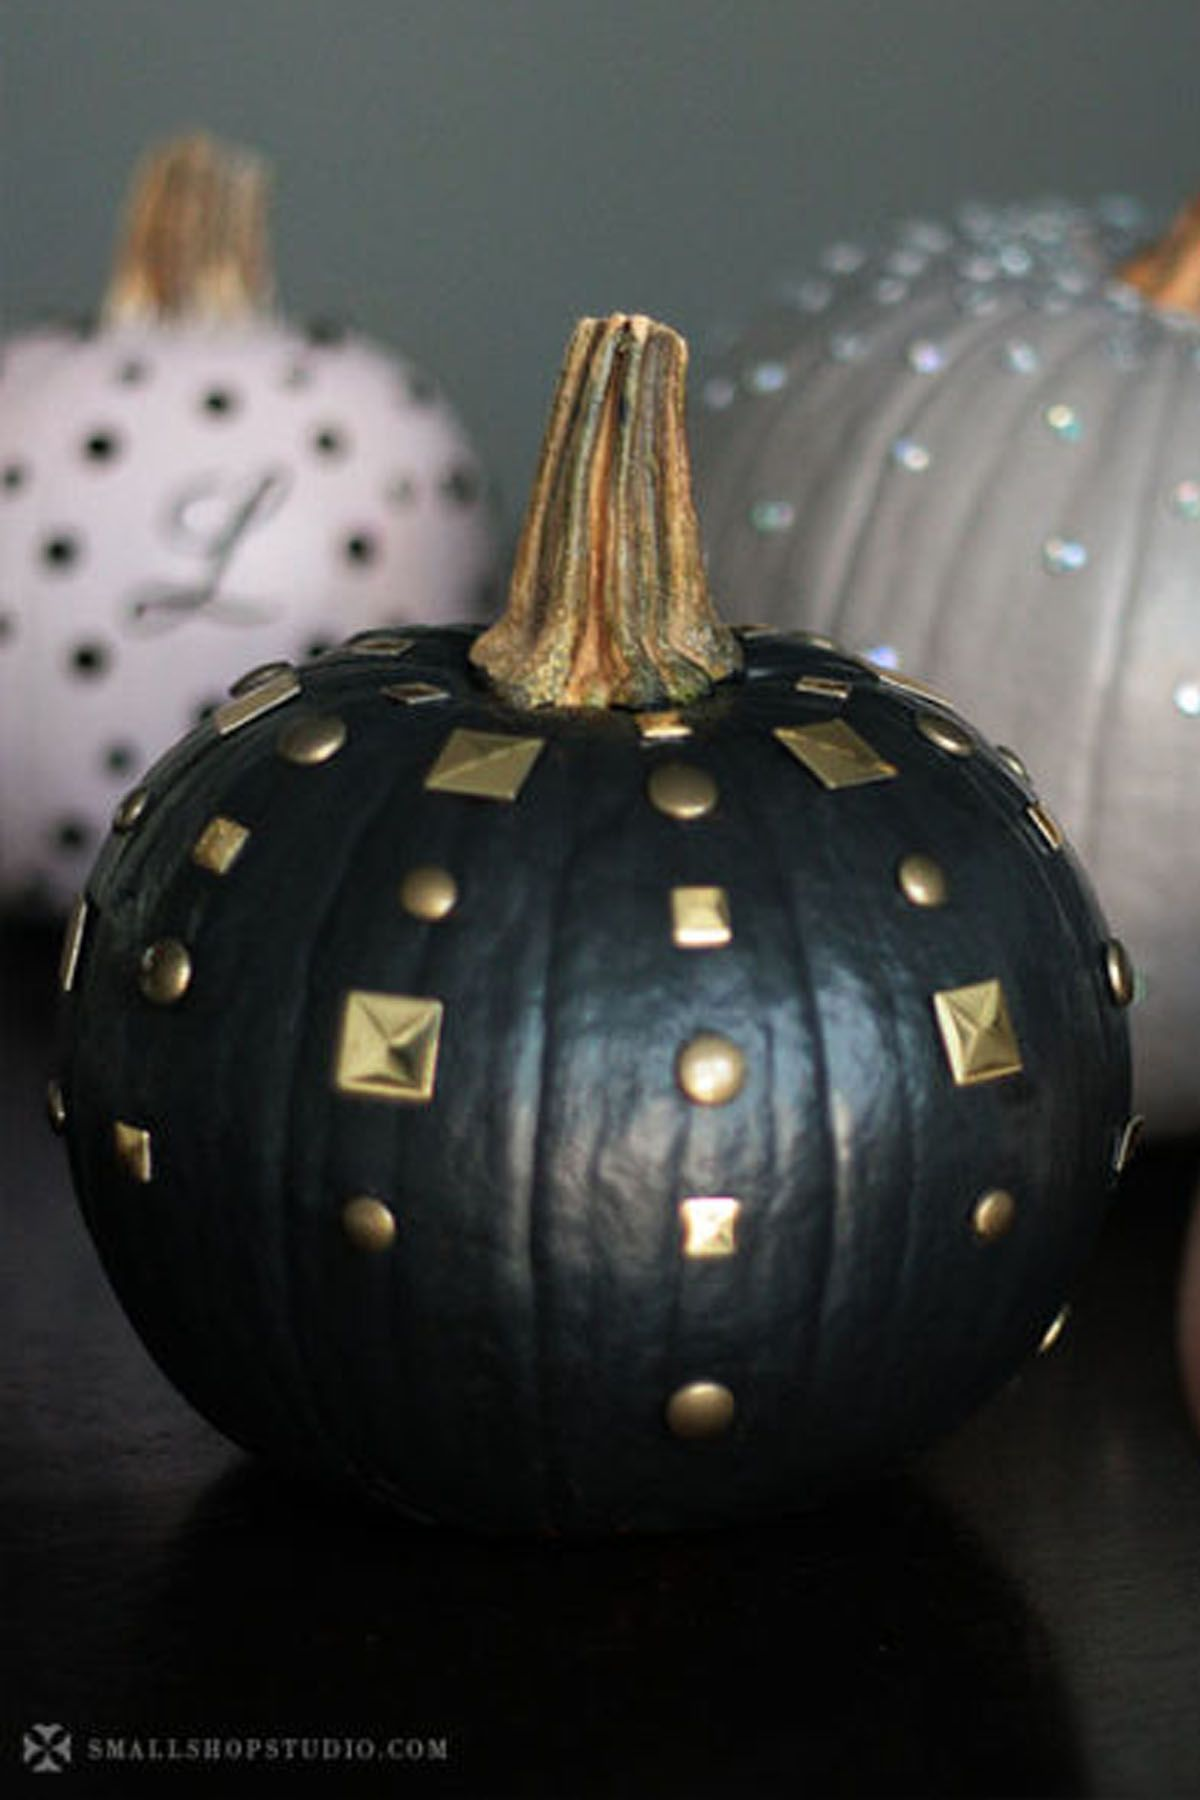 35 Halloween Pumpkin Painting Ideas - No Carve Pumpkin Decorating